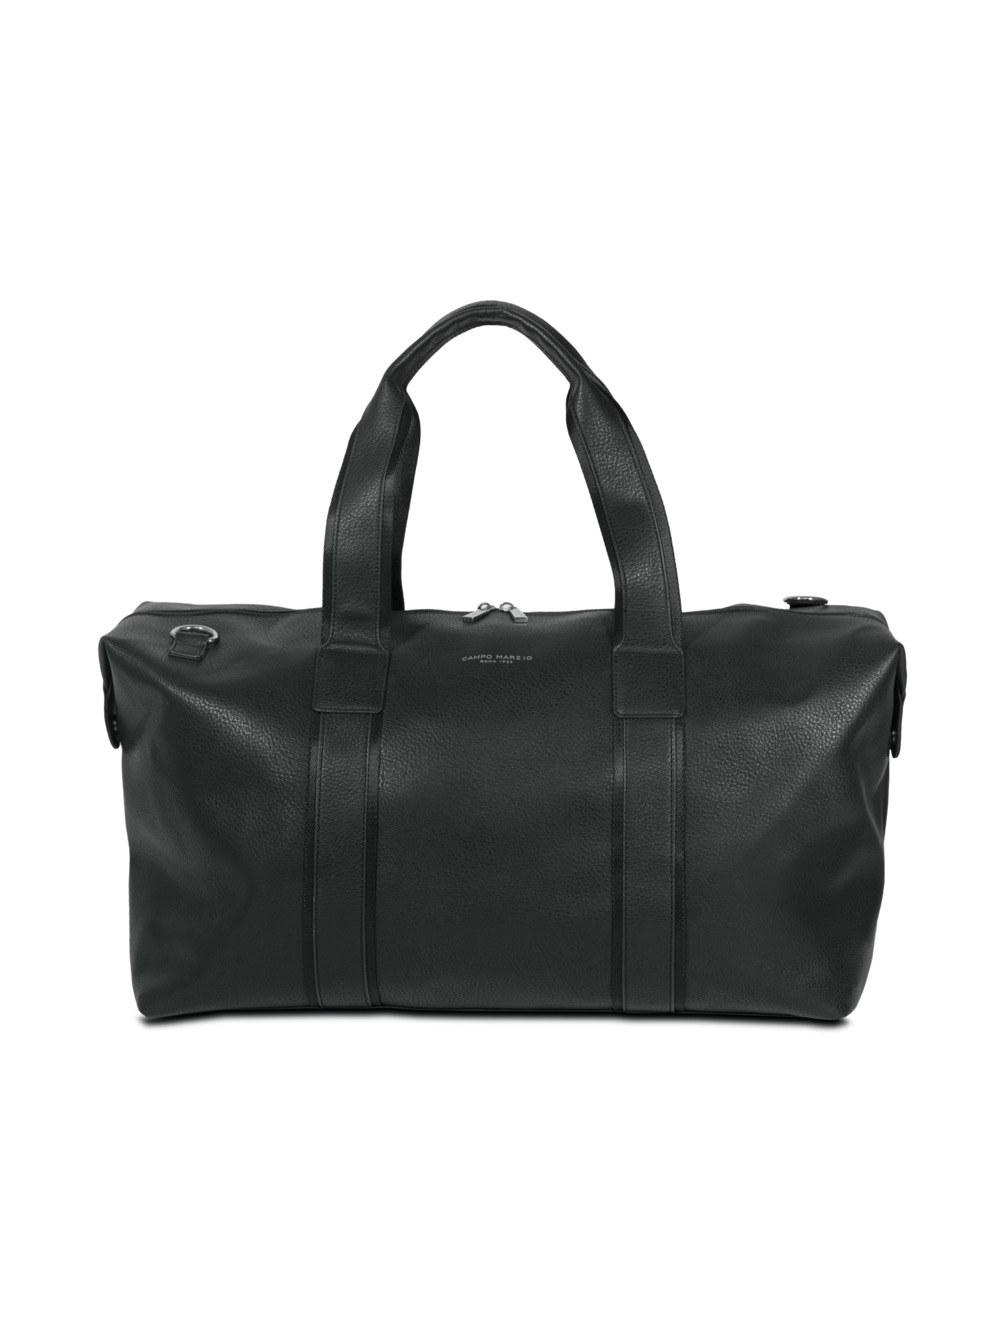 Roald Travel Bag - Black